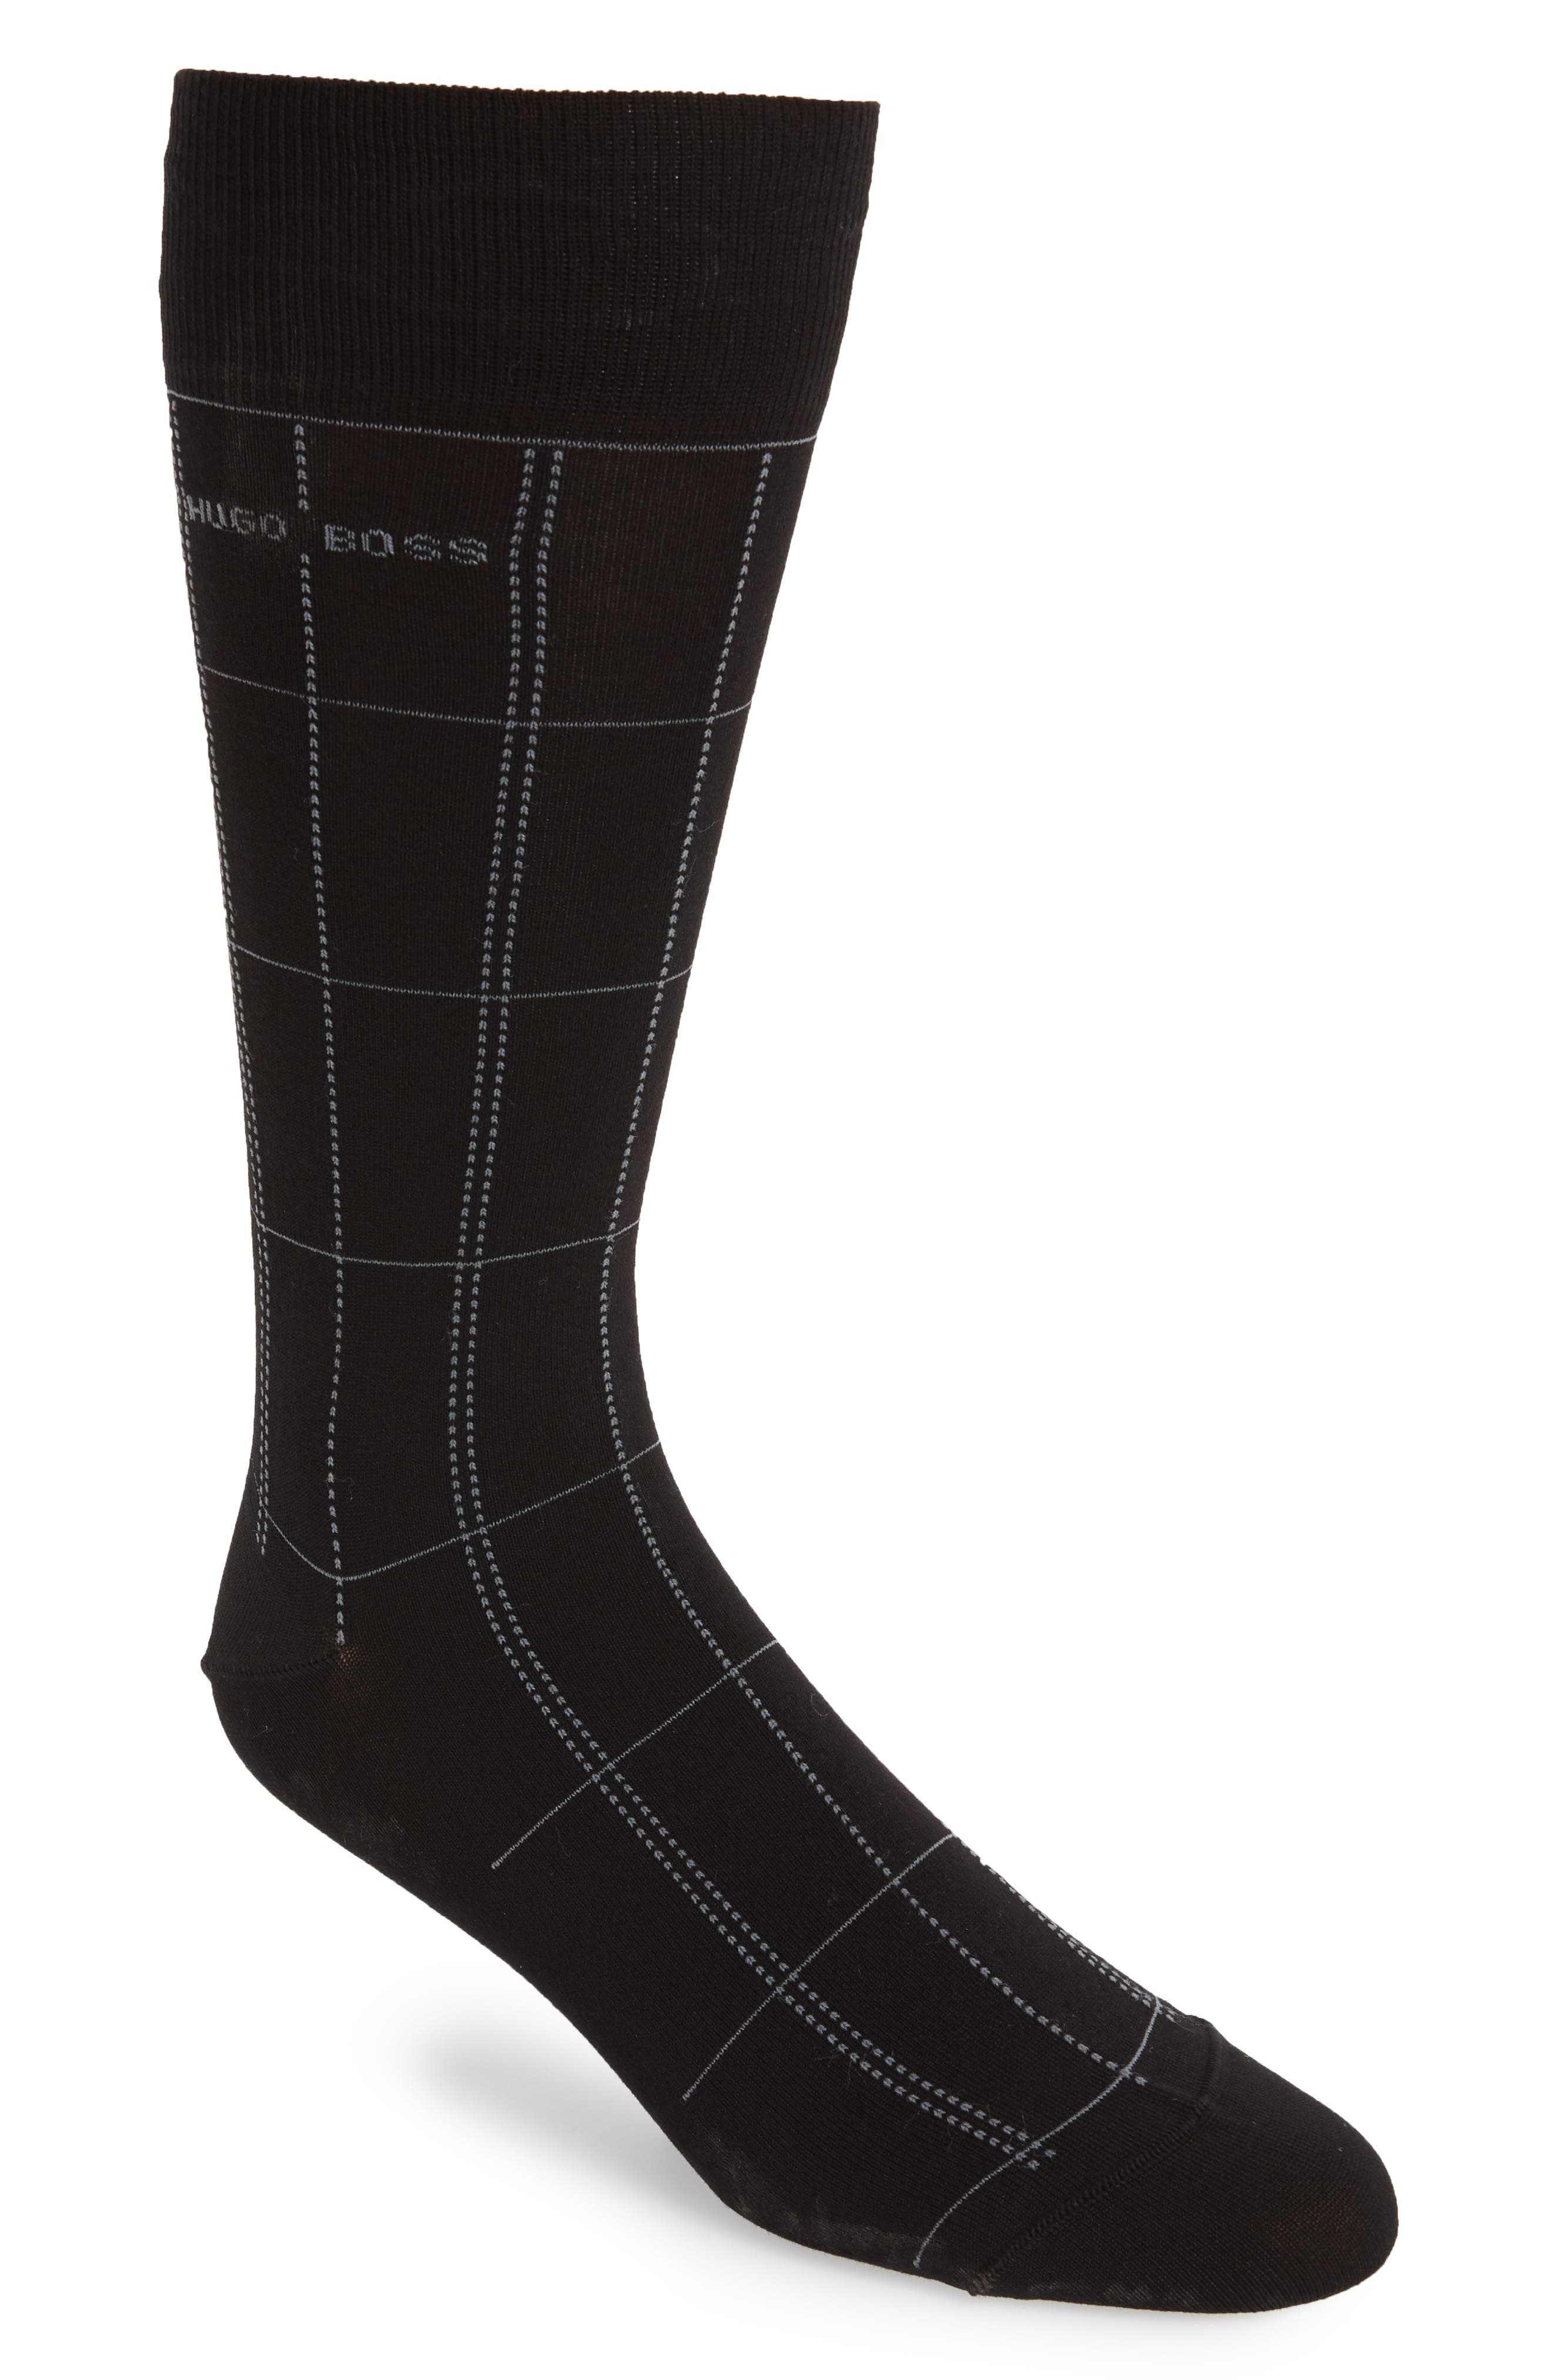 Check Socks,                             Main thumbnail 1, color,                             Black